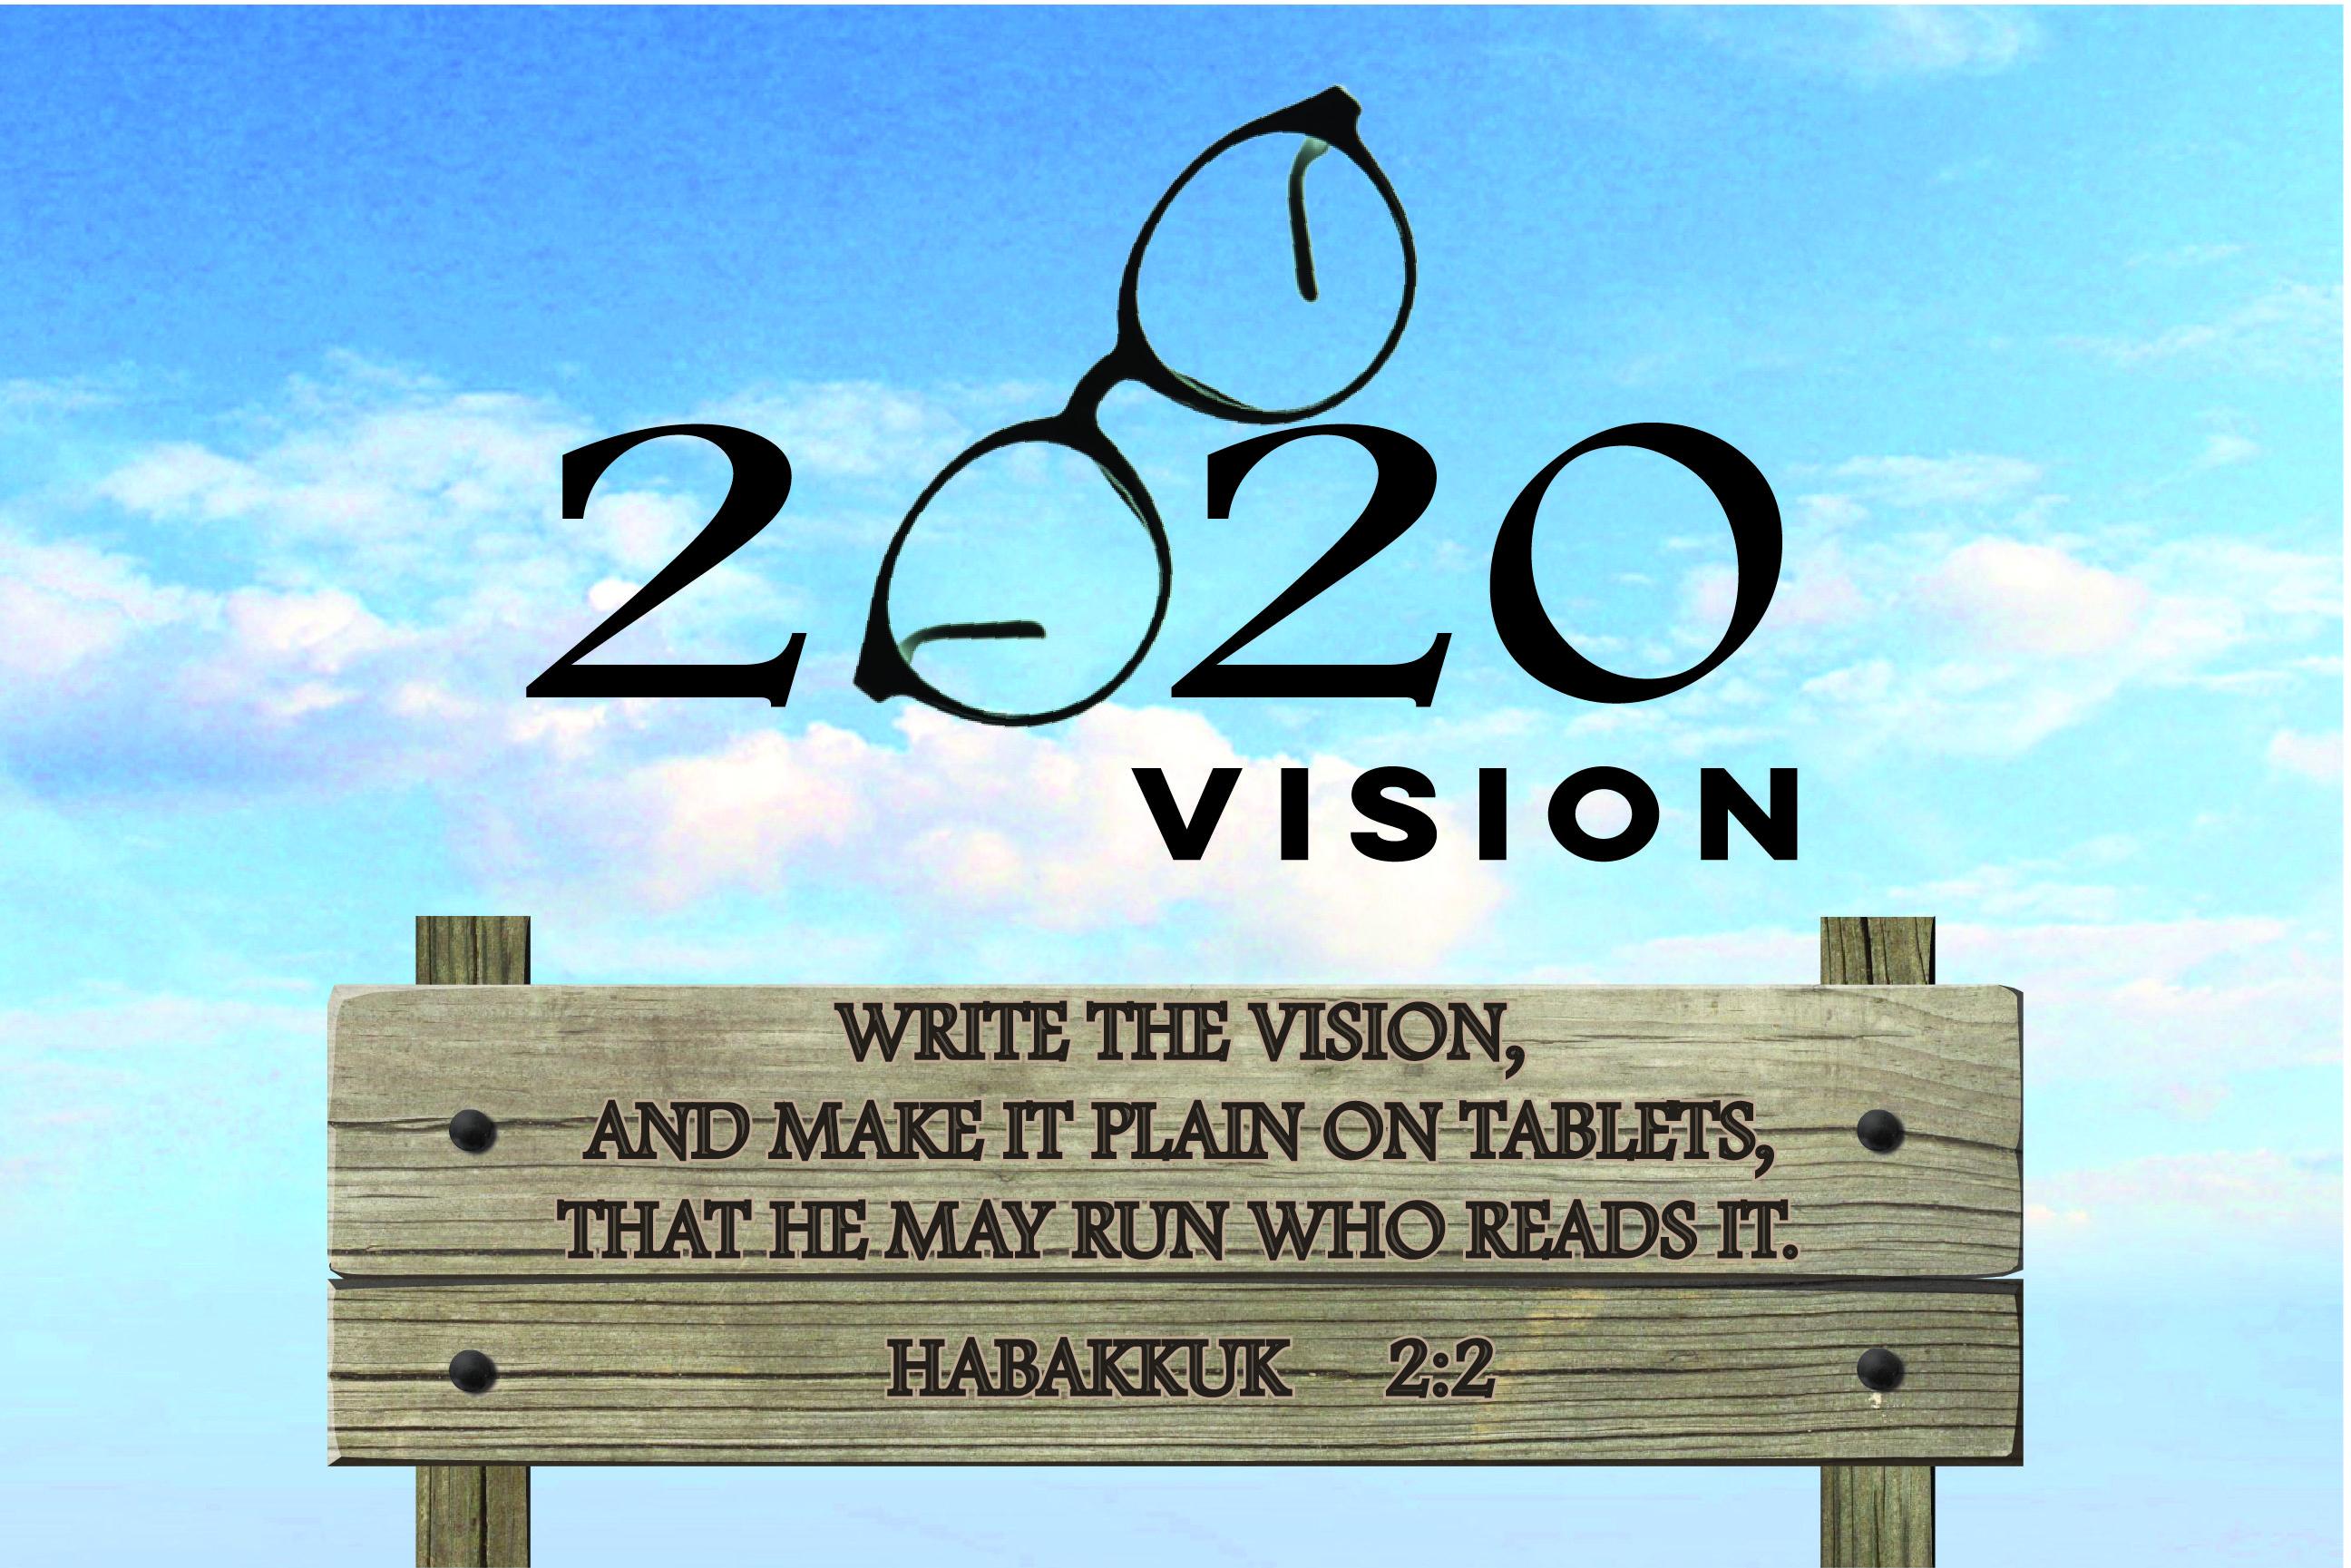 2020 vision - theme